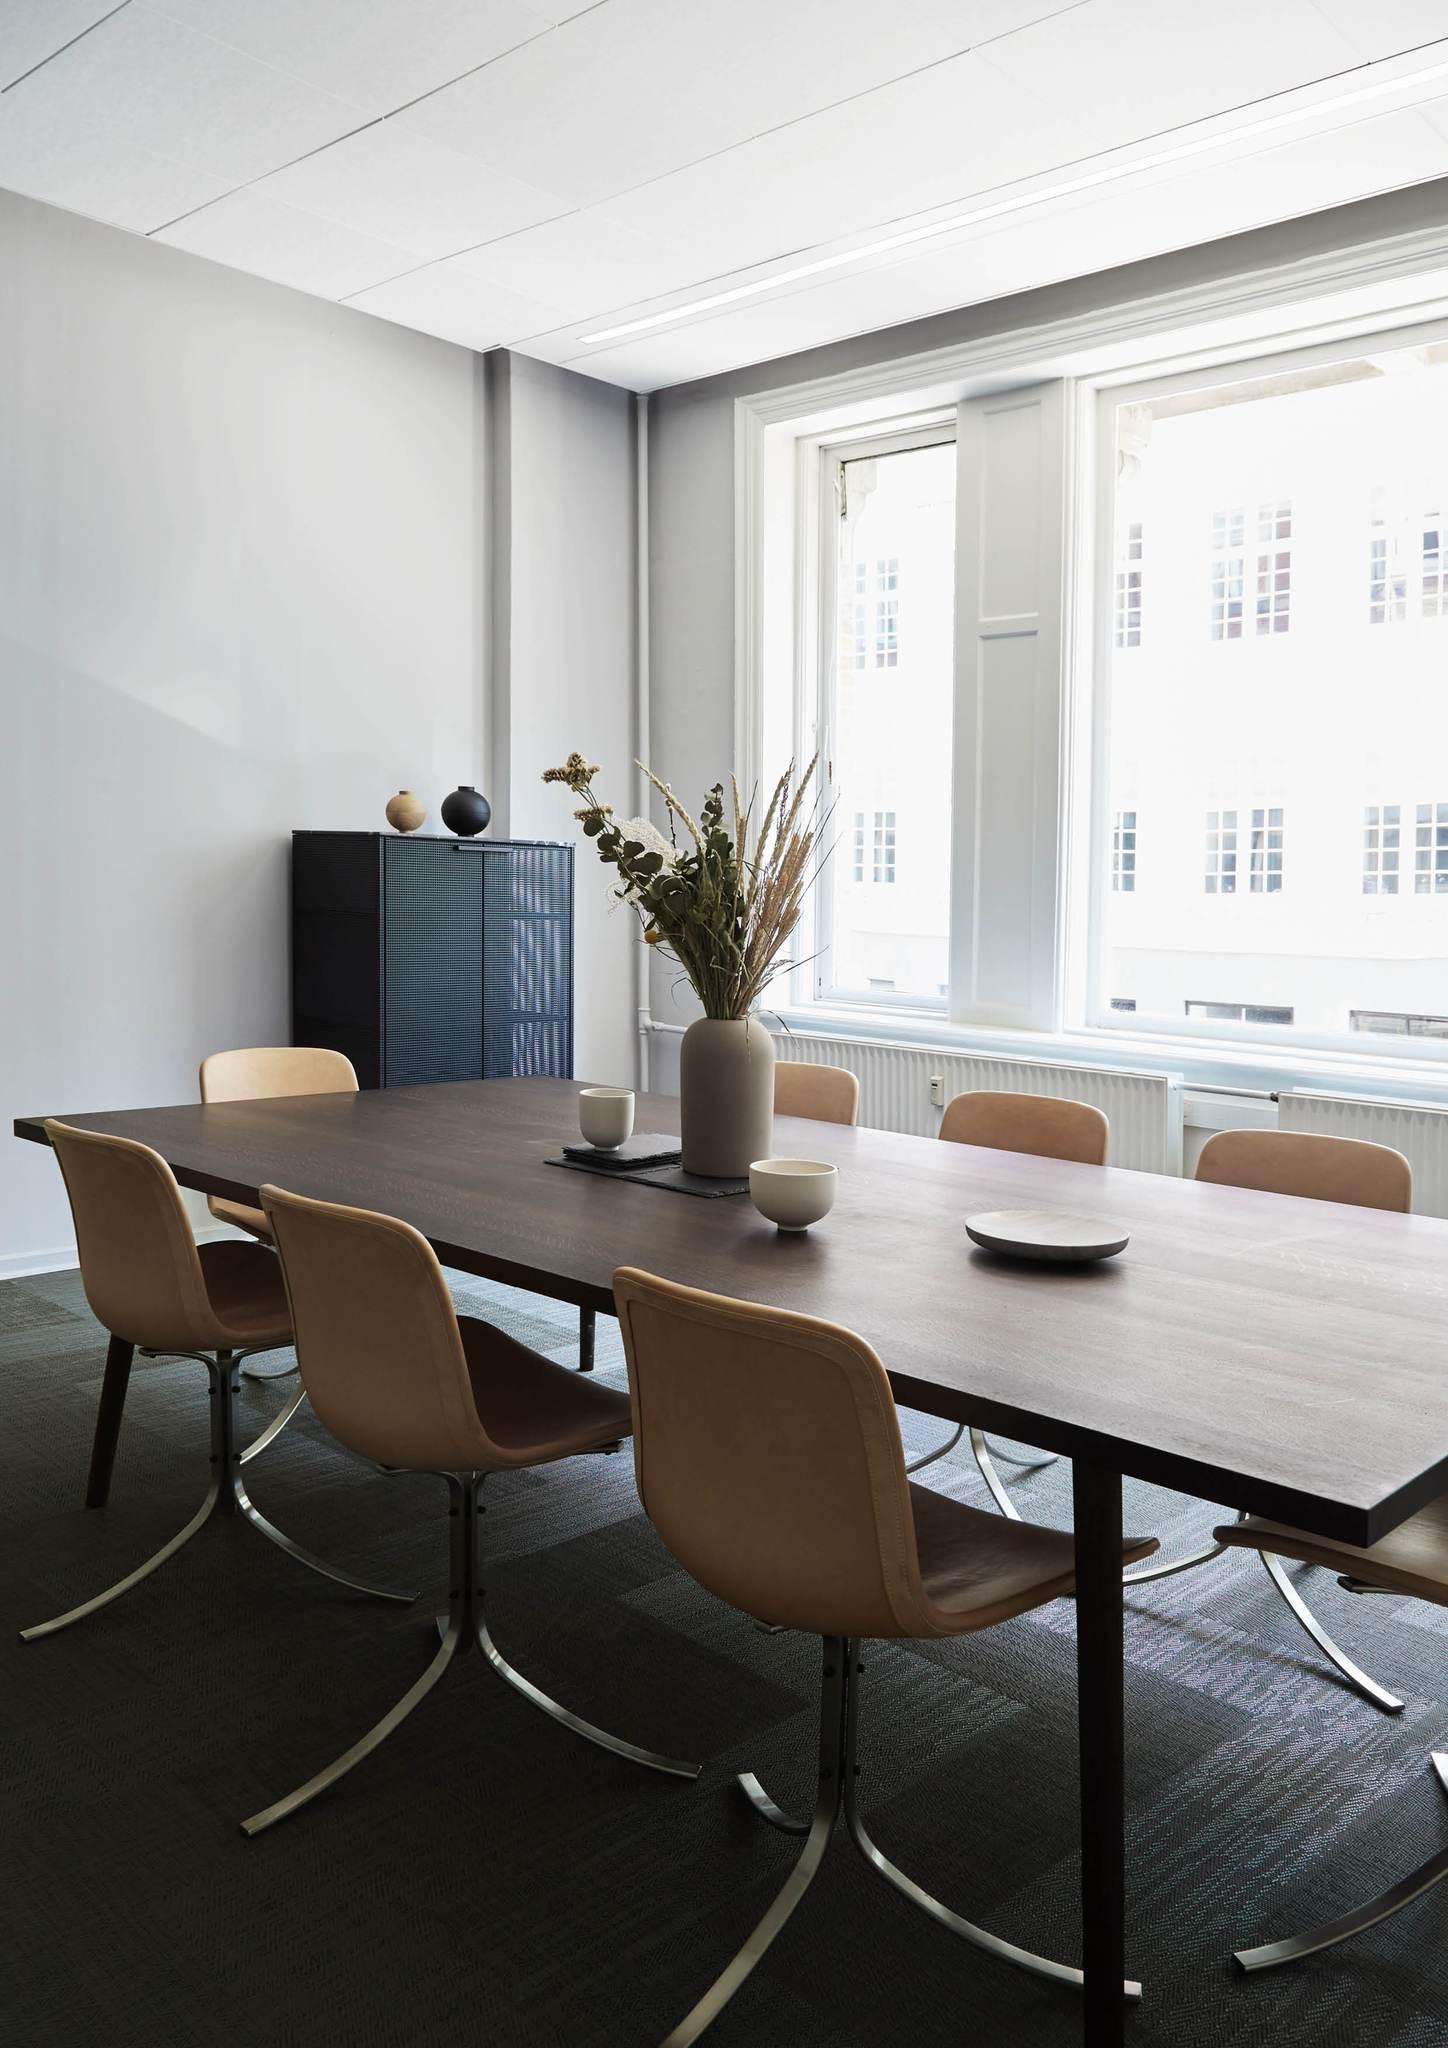 Kristiana-dam-studio-interio-office-3.jpg